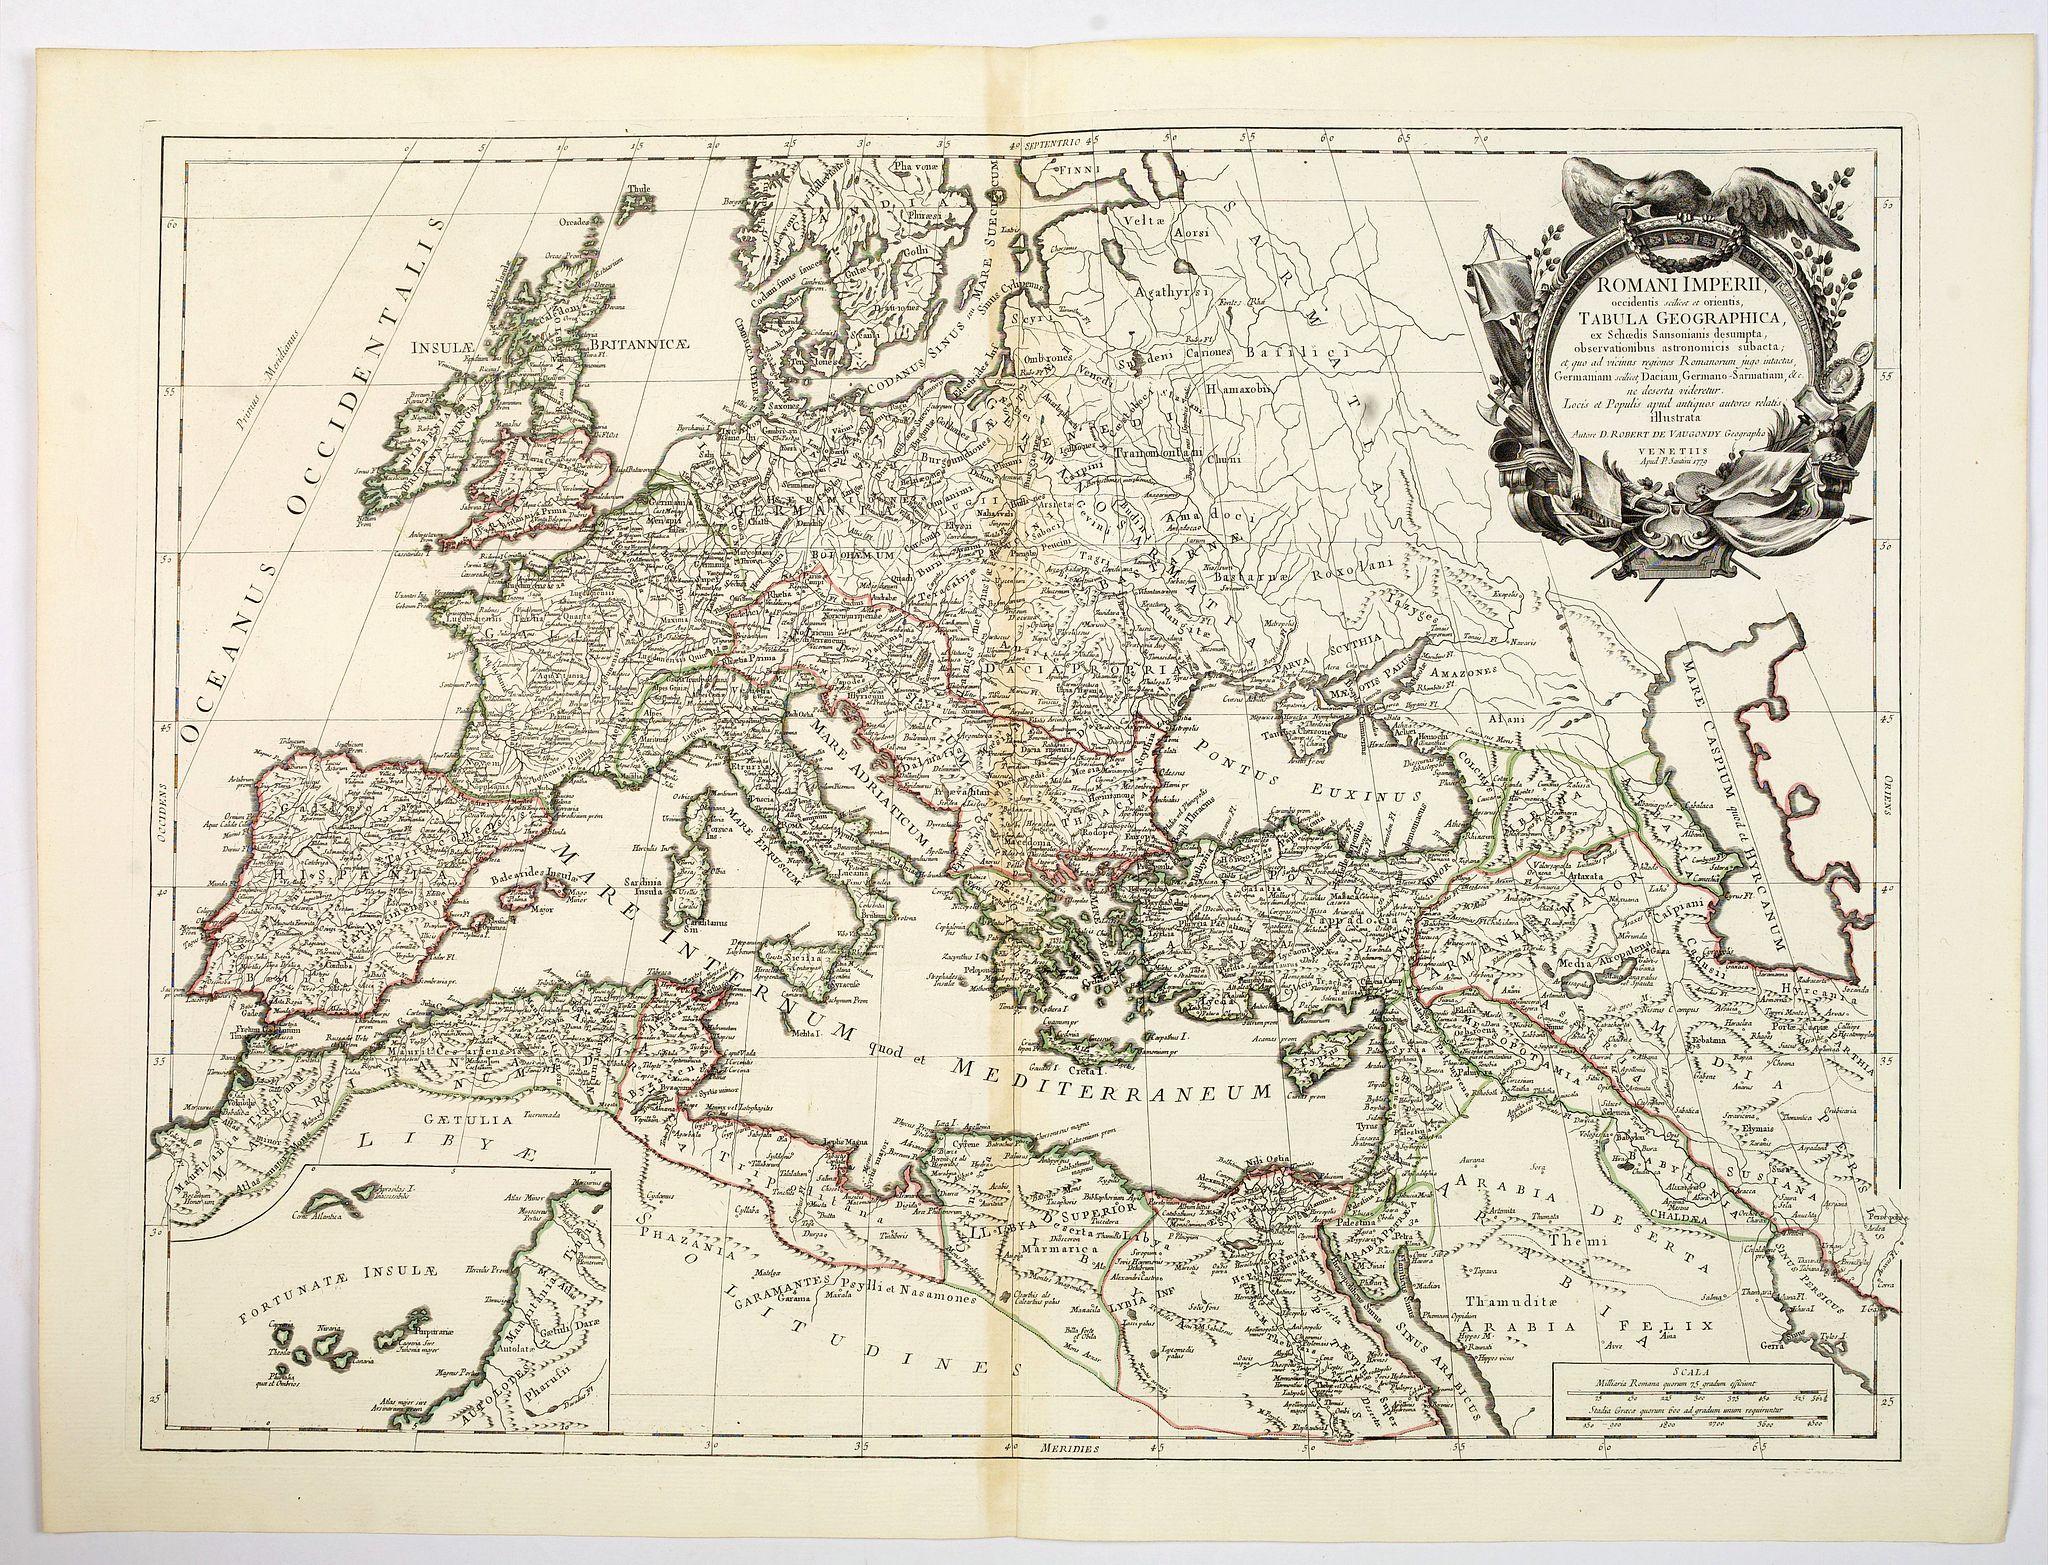 SANTINI, P. / REMONDINI, M. -  Romani Imperii occidentis . . . Tabula Geographica. . .